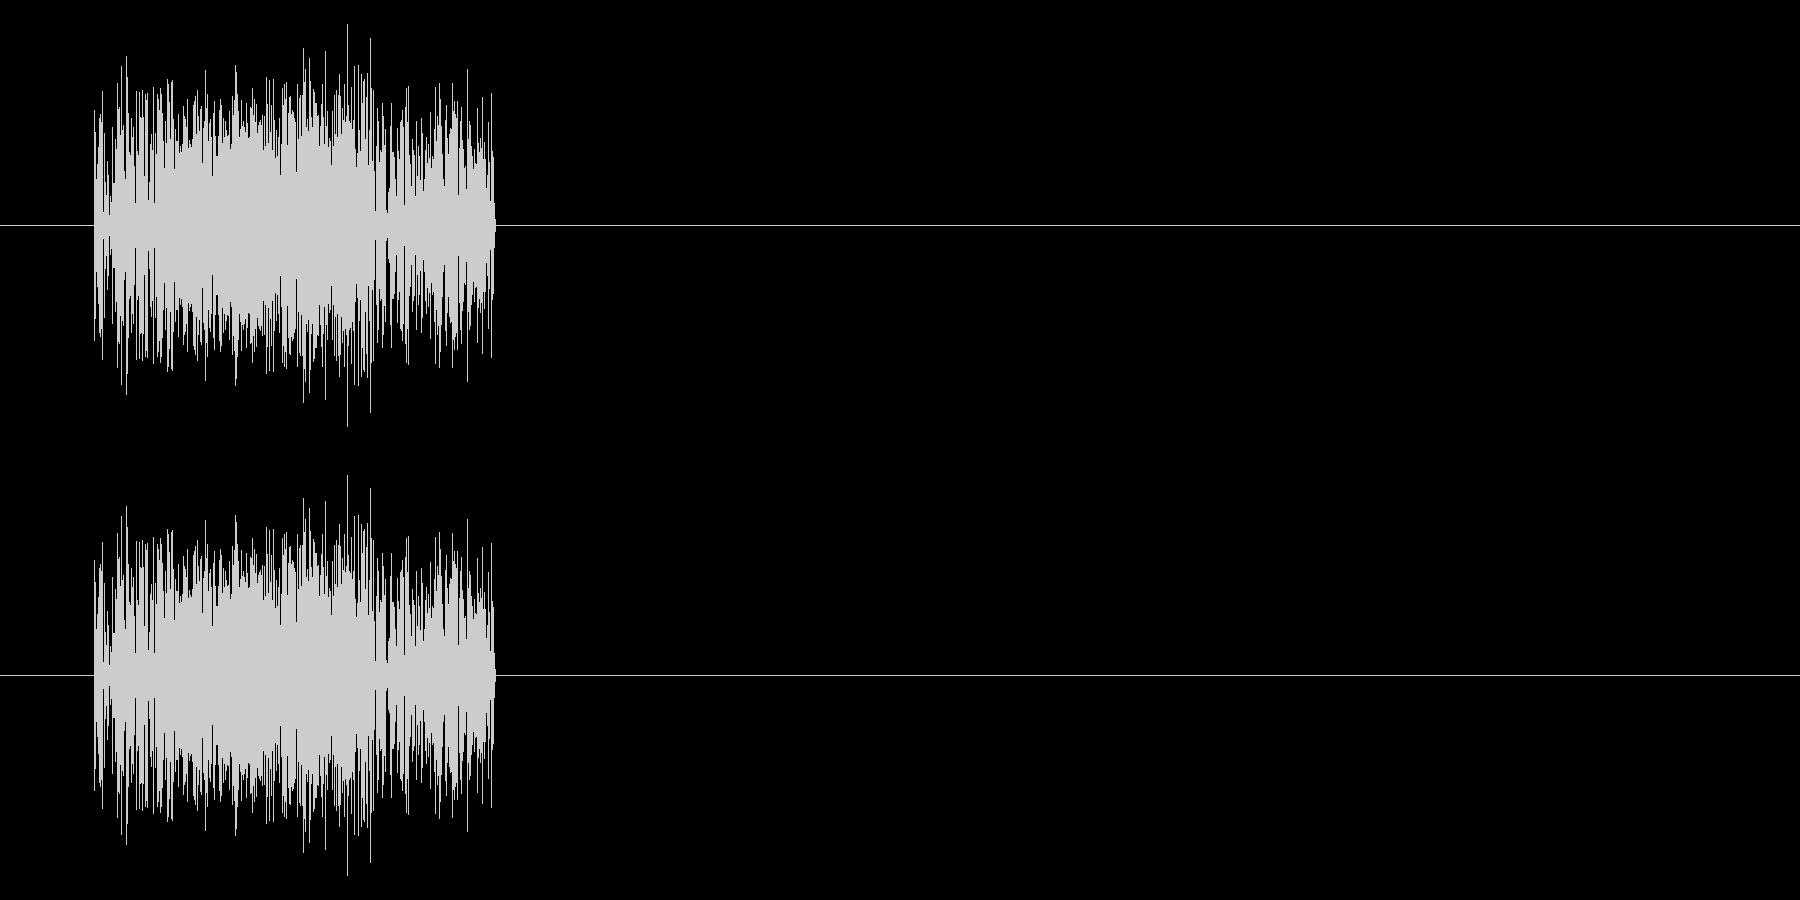 【NES RPG03-06(魔法 雷)】の未再生の波形